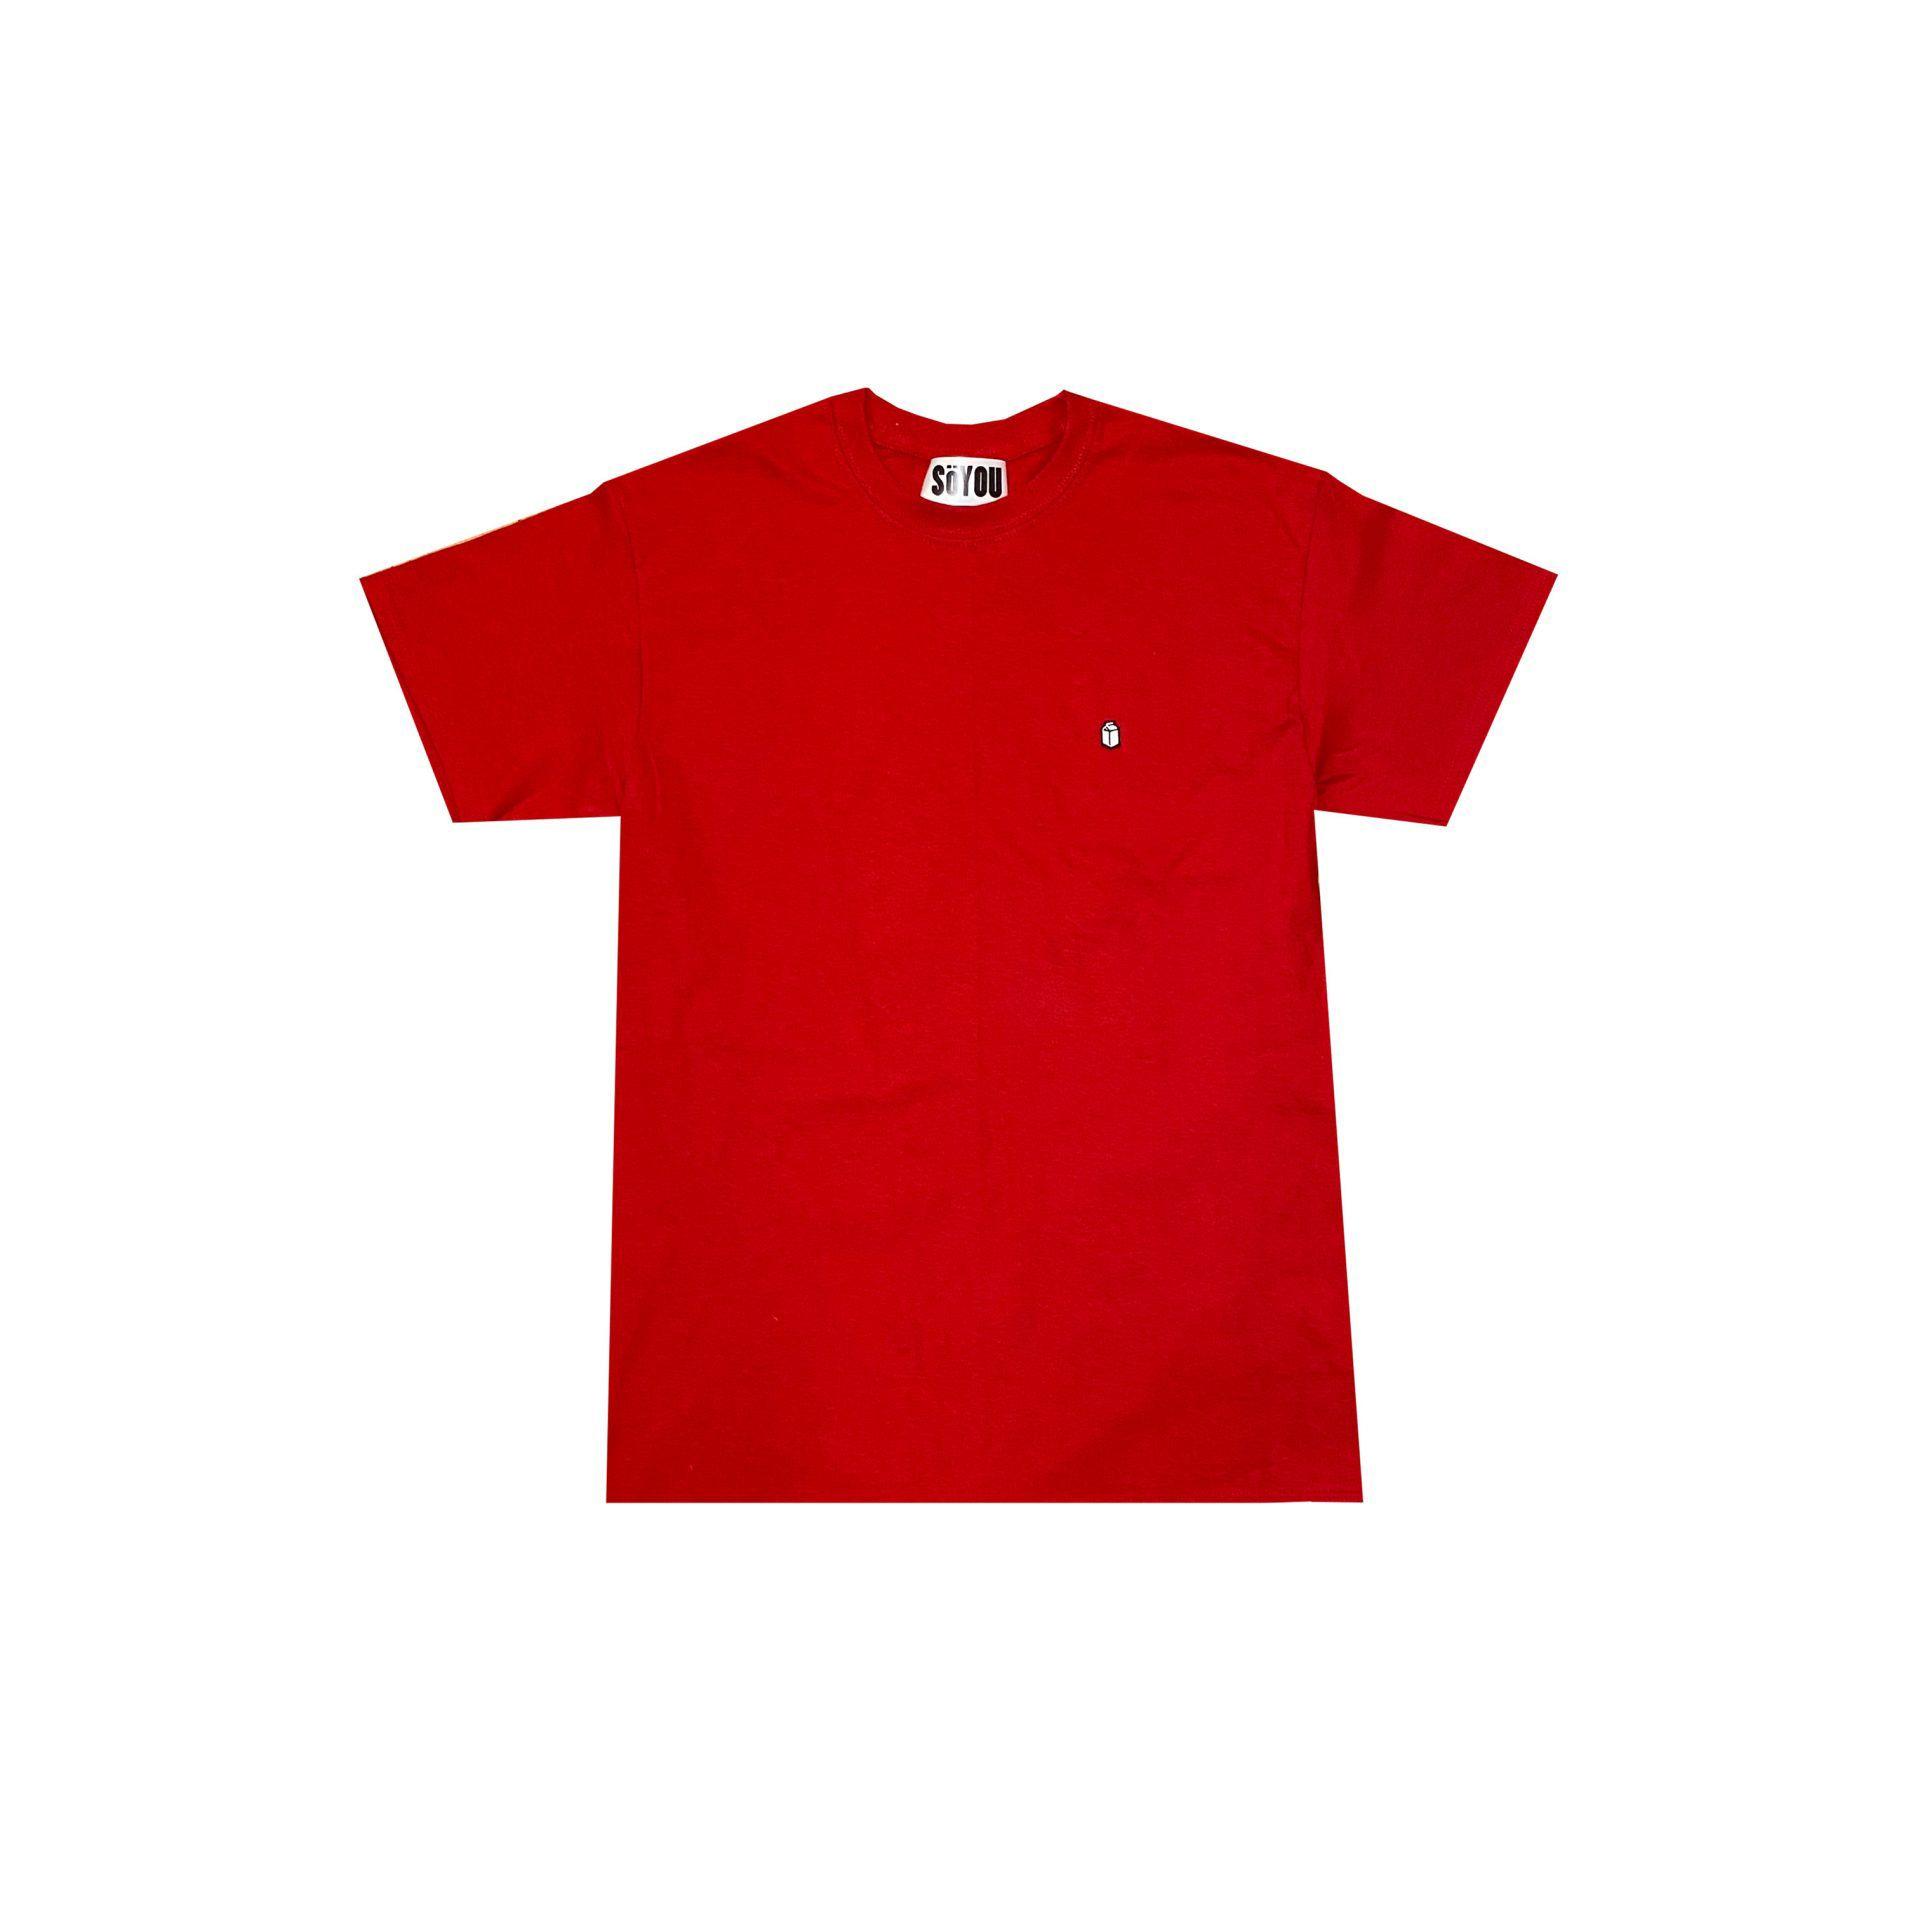 SoYou Clothing Basics T-Shirt in Red Canoe